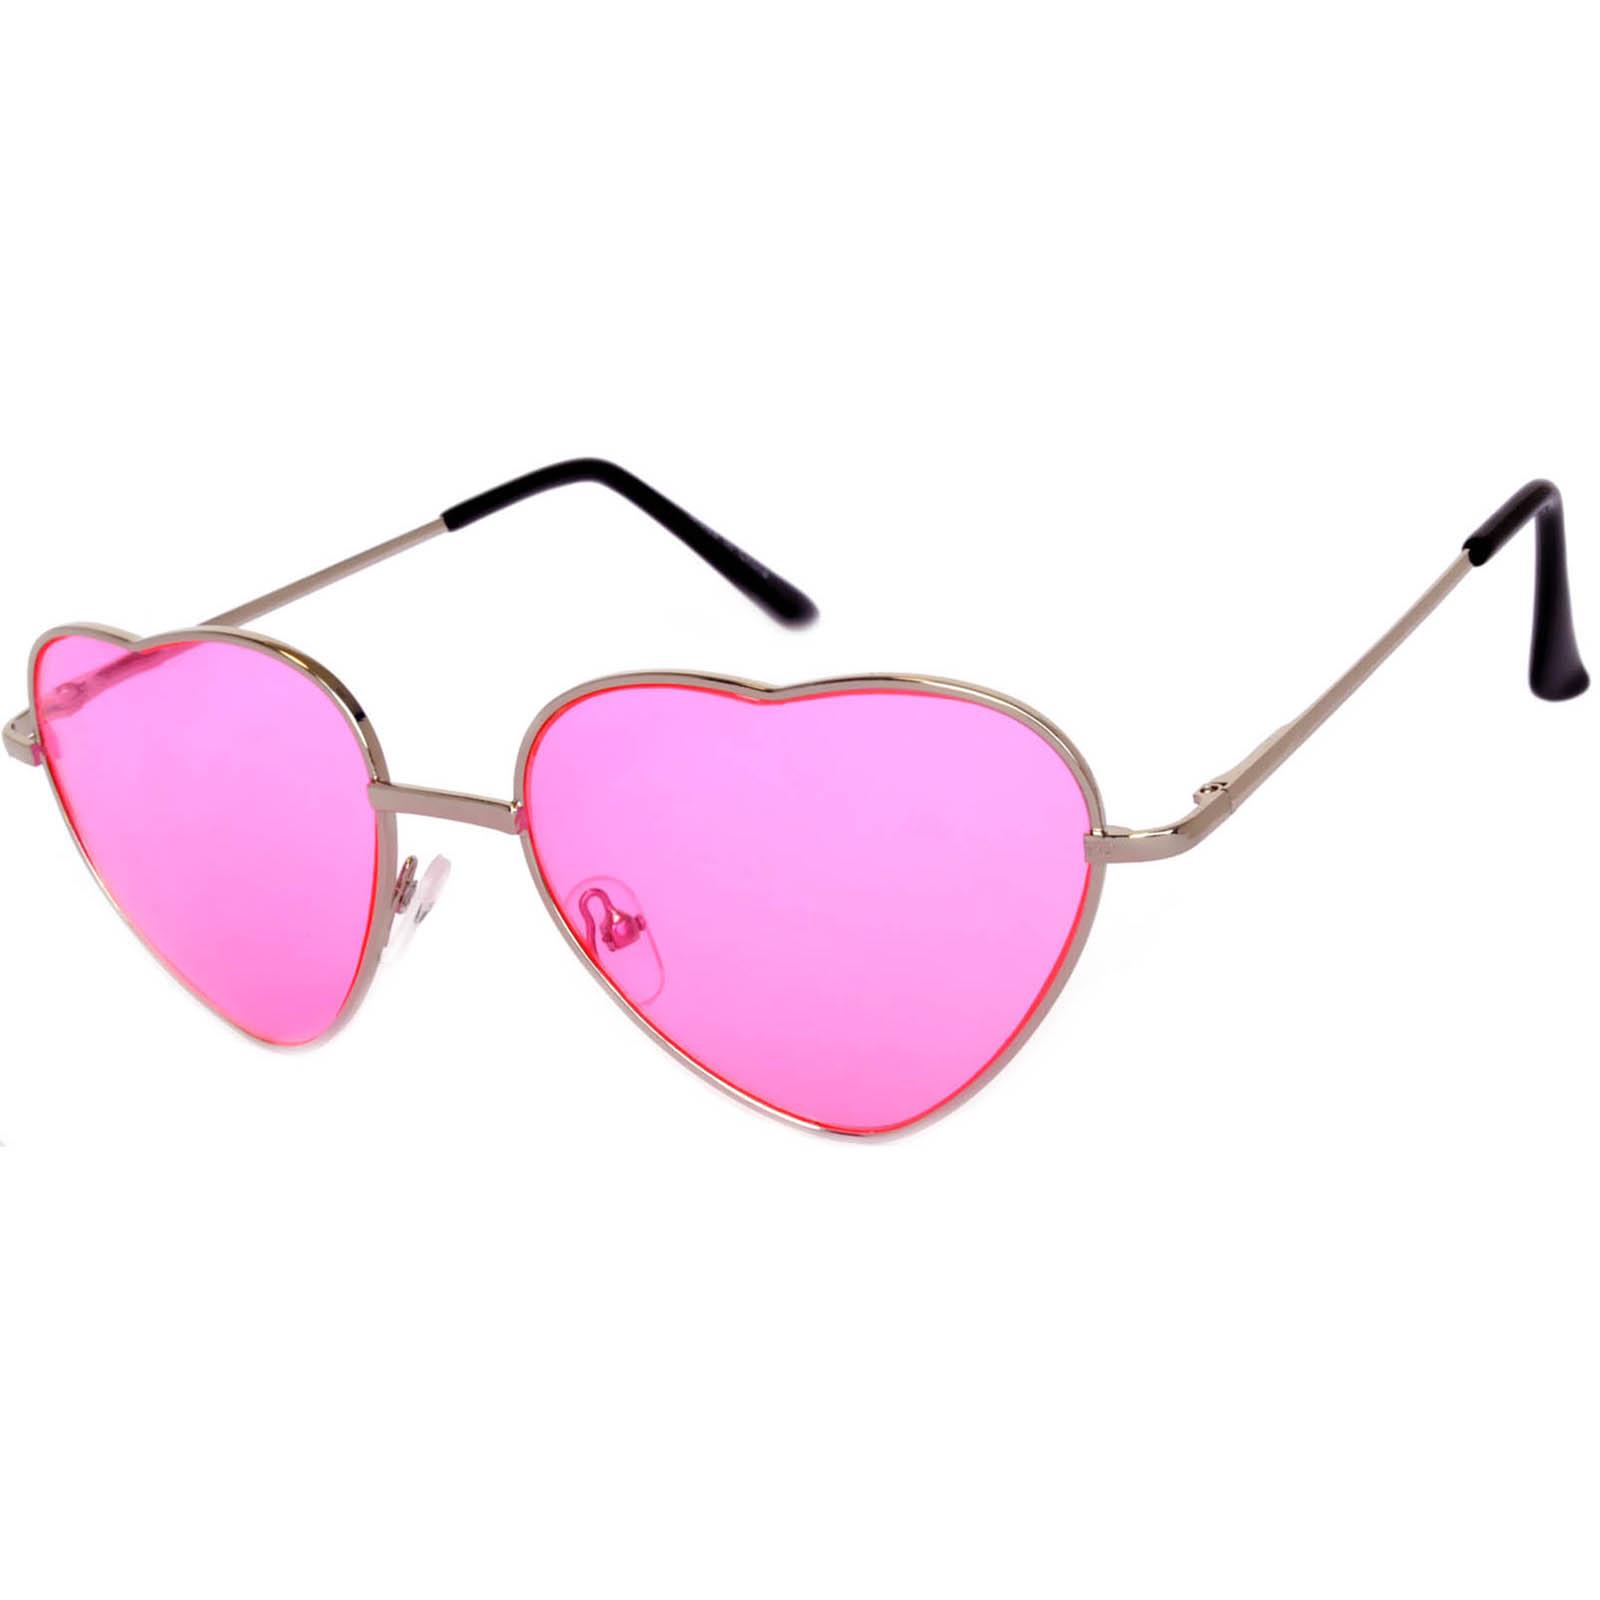 dbb118f6a03 OWL ® Eyewear Sunglasses Heart Women s Metal Silver Frame Pink Lens ...